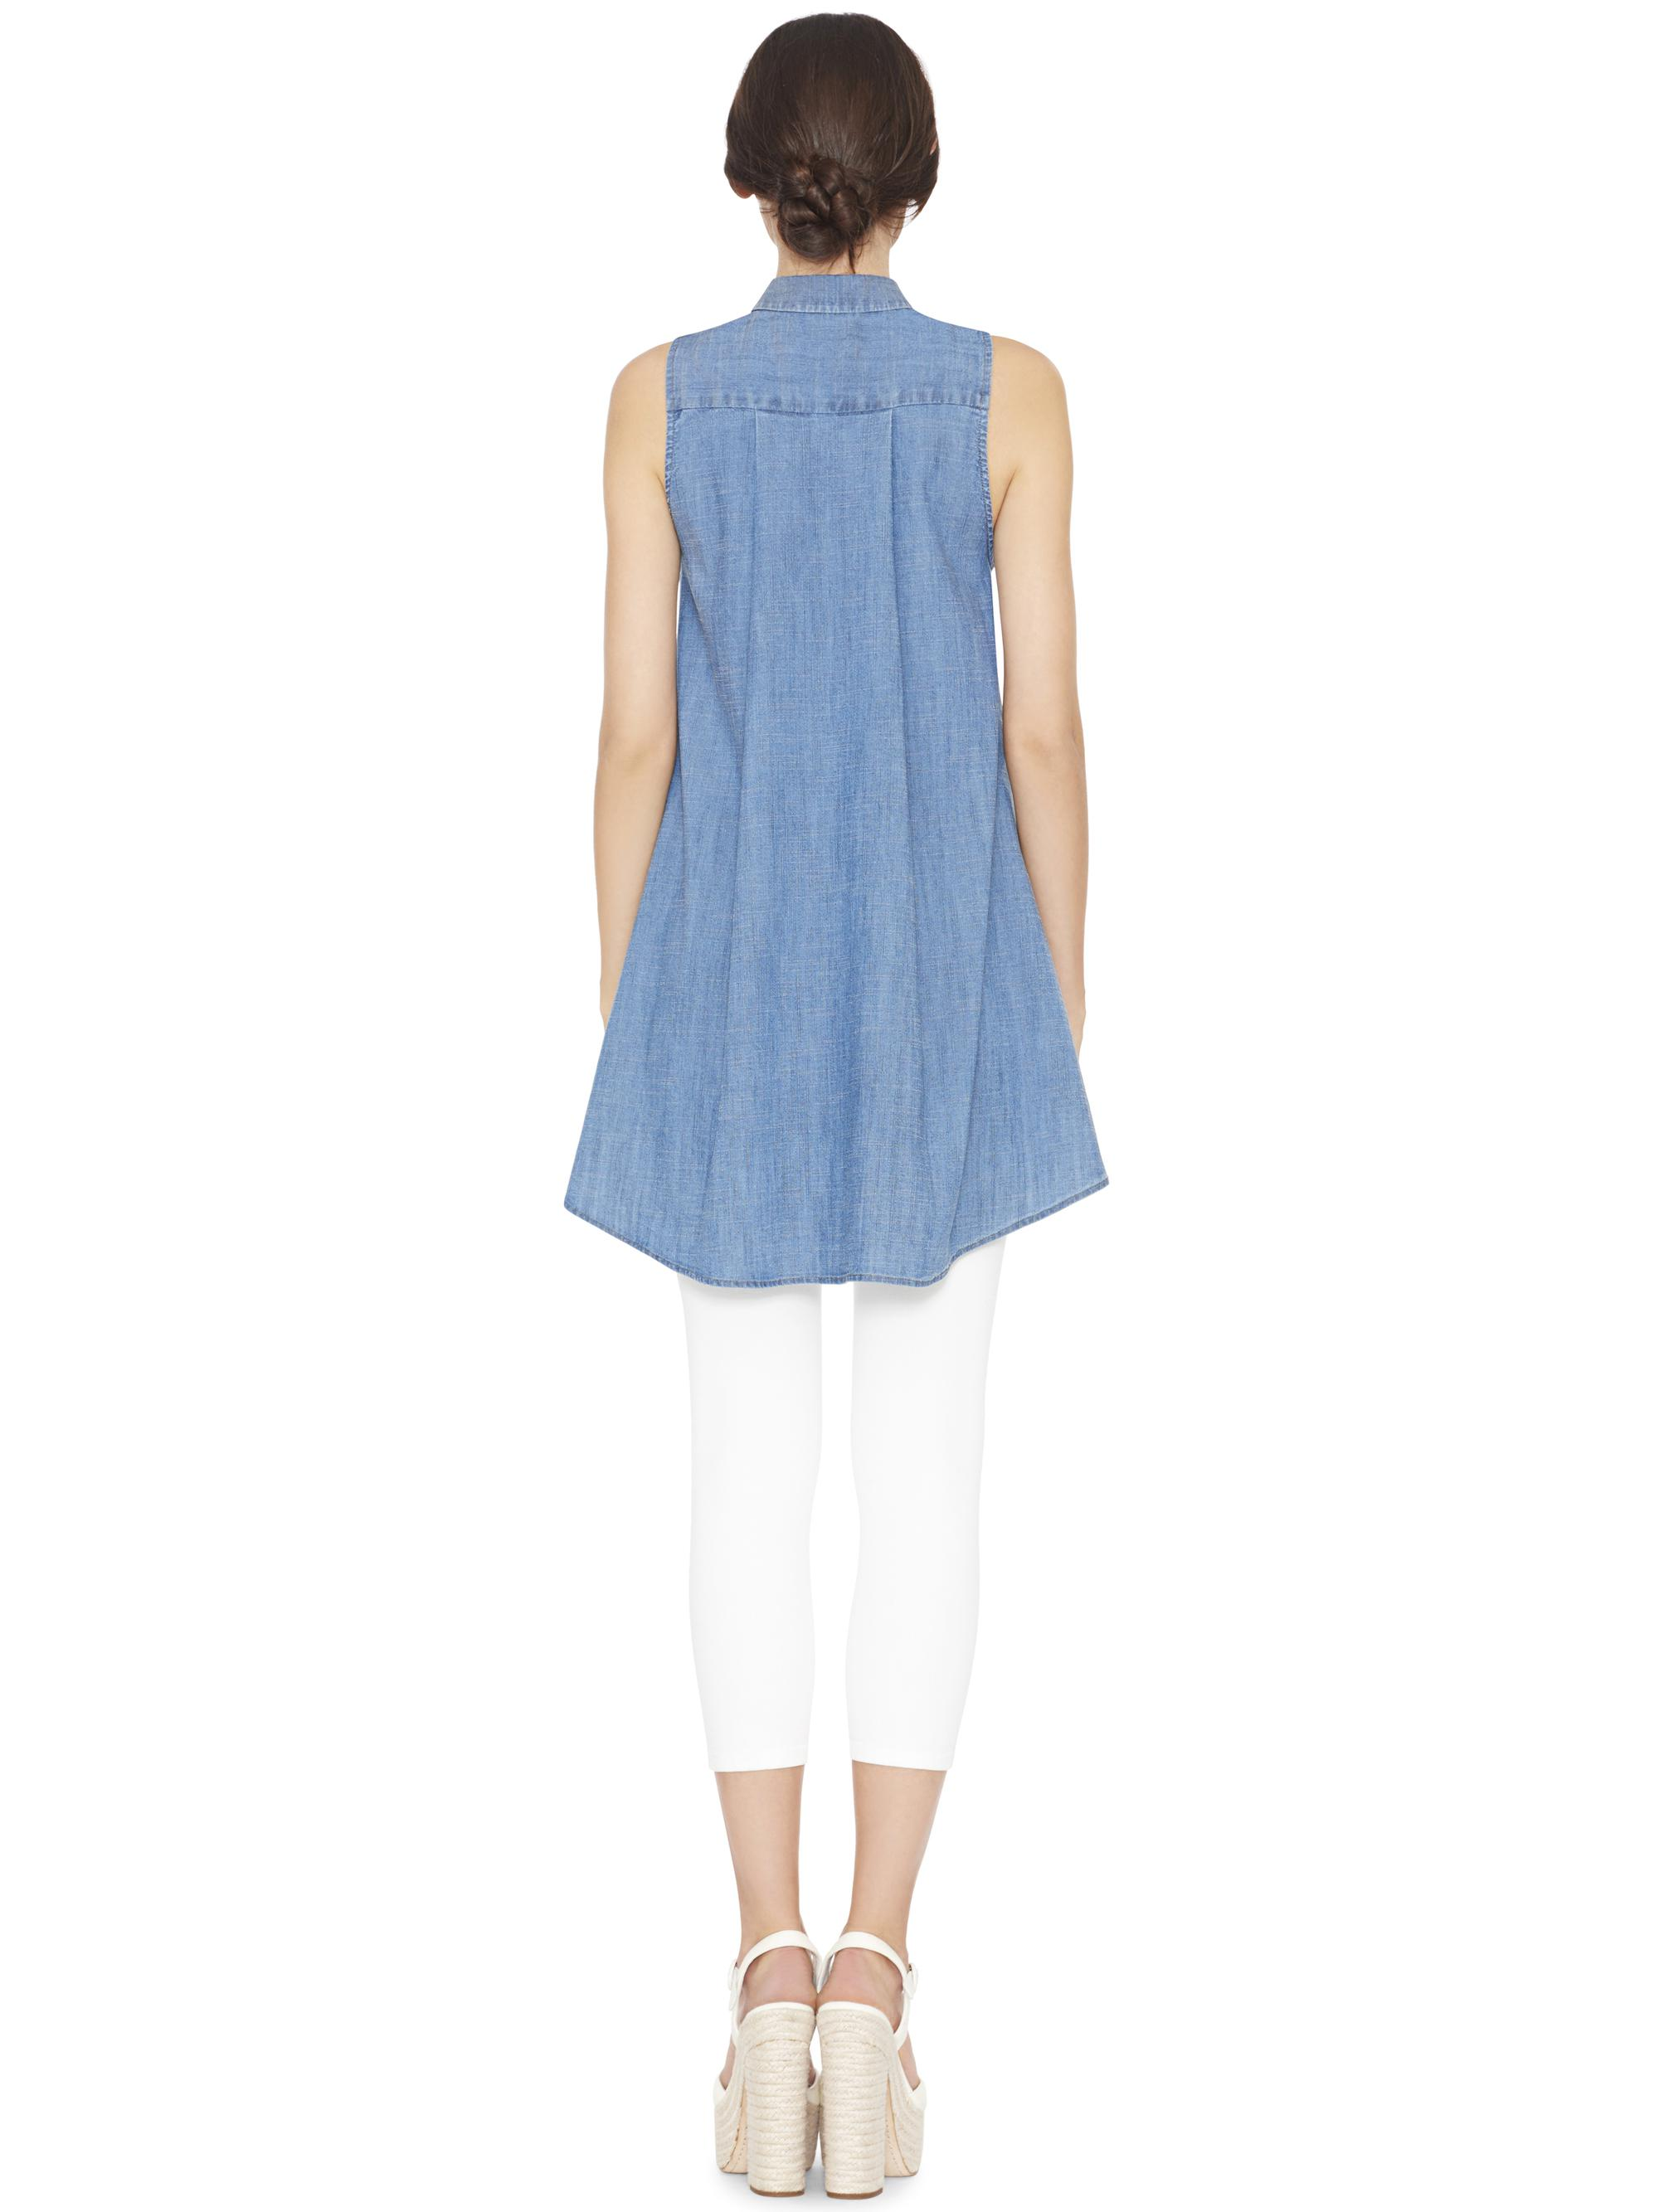 8ebaa9fbdfa Alice + Olivia Anisa Sleeveless Flowy Tunic Top in Blue - Lyst